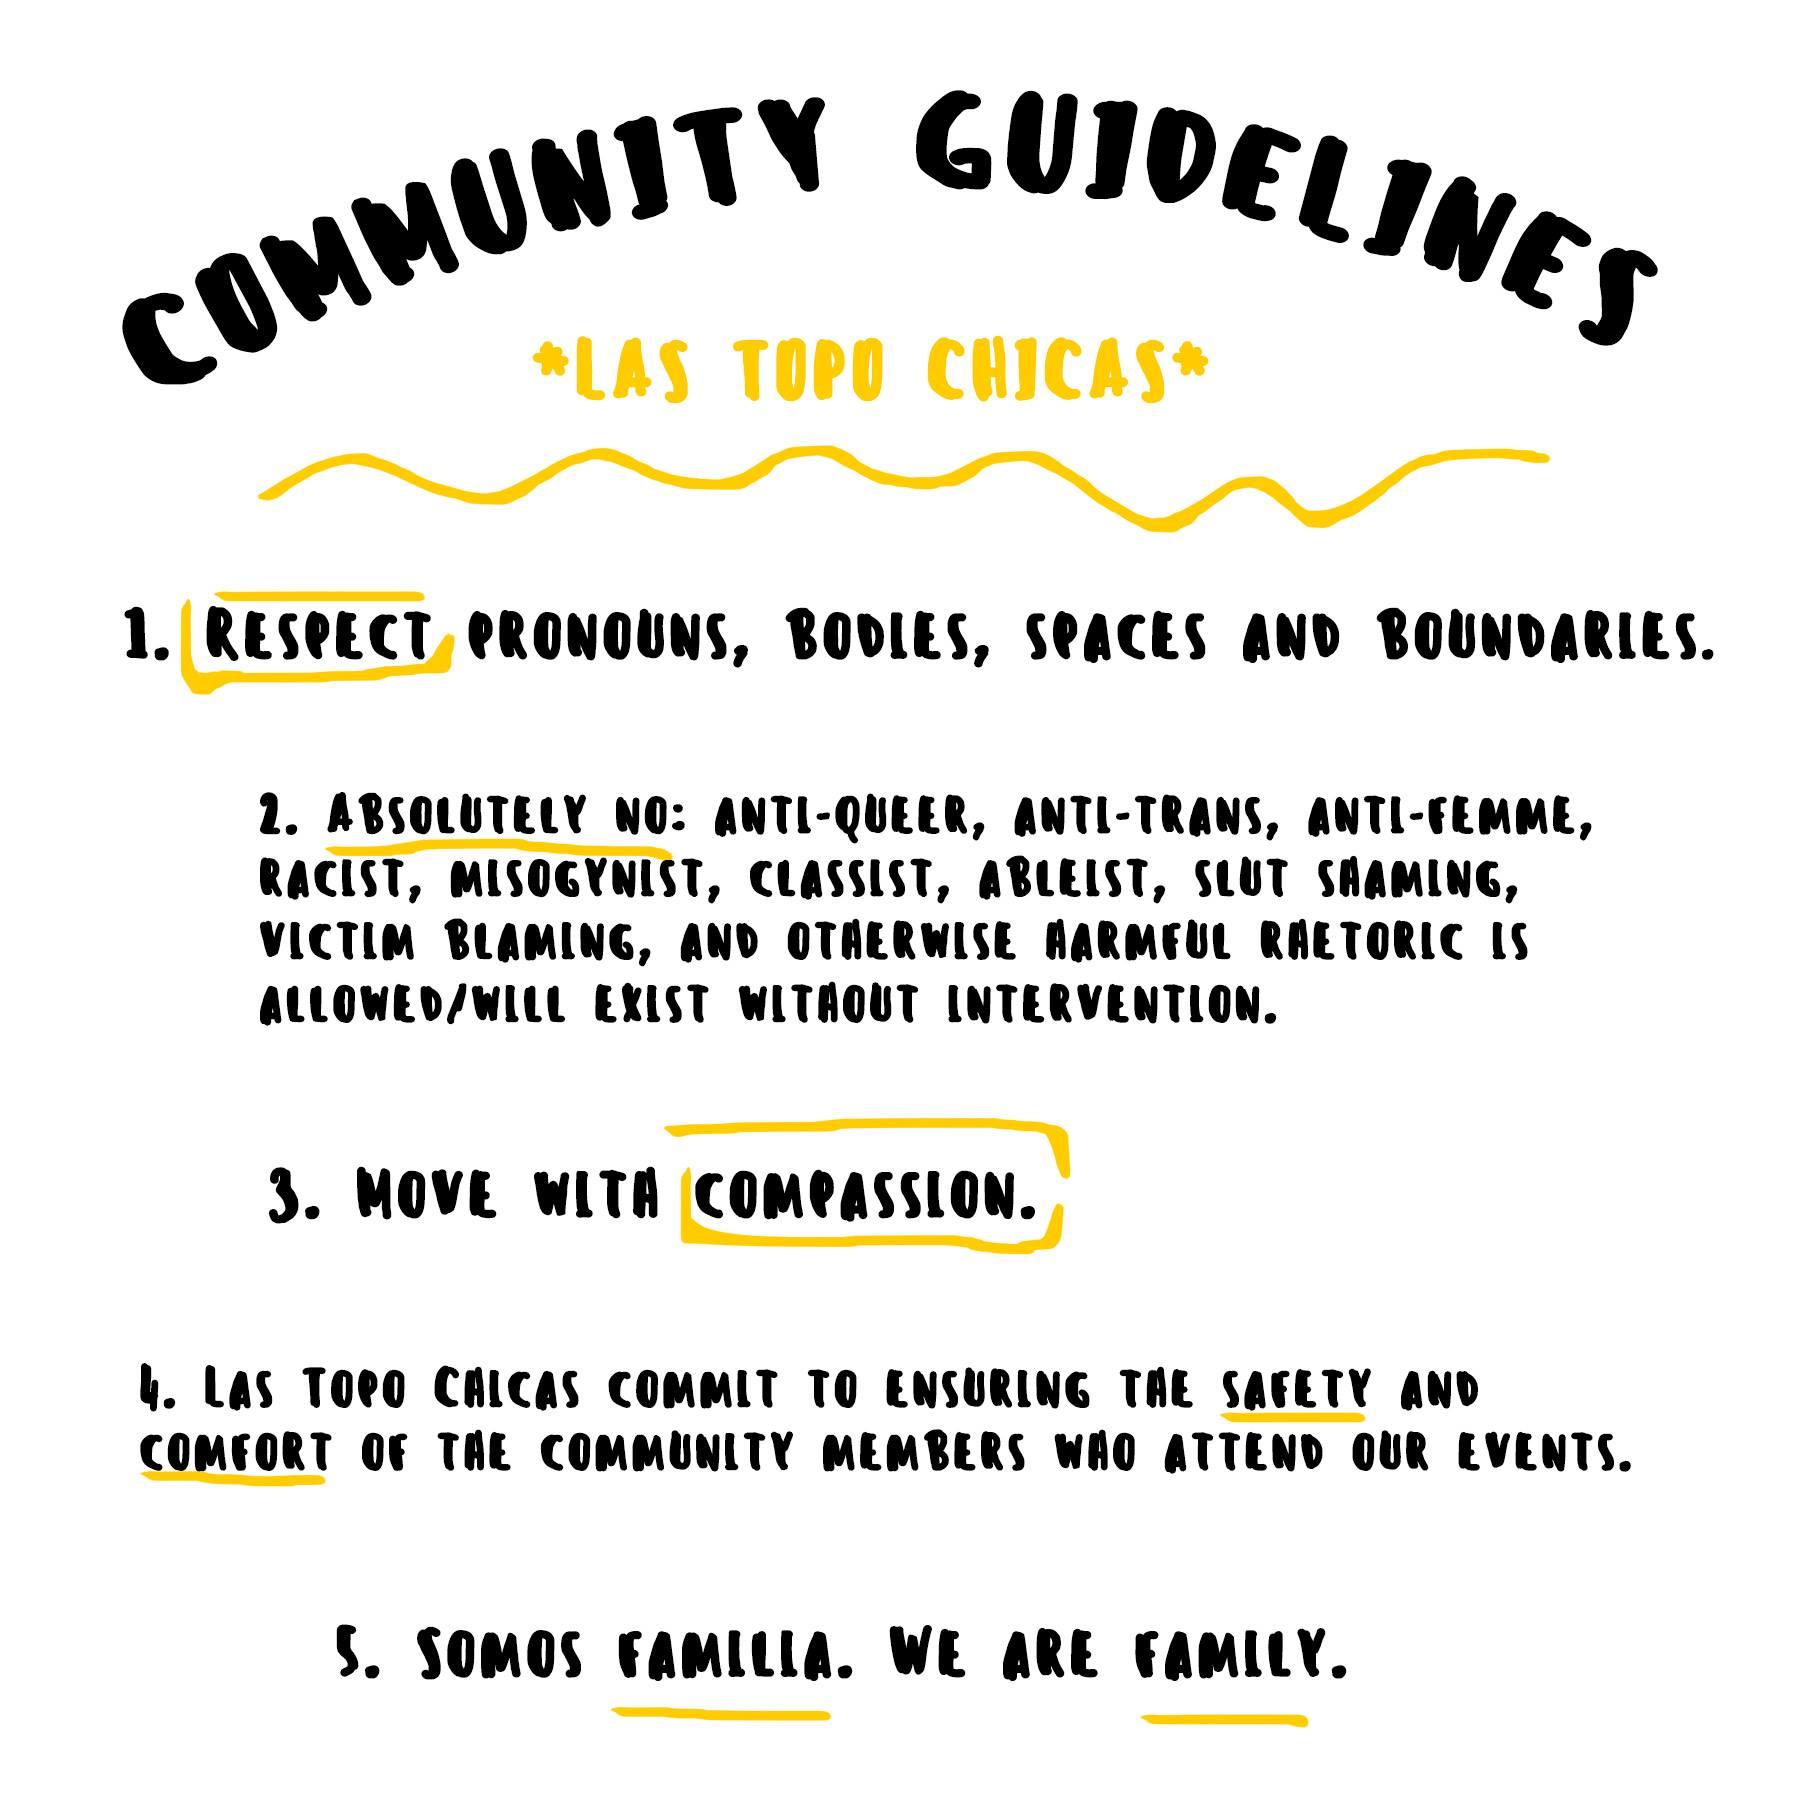 LTC_community_guidelines.jpg